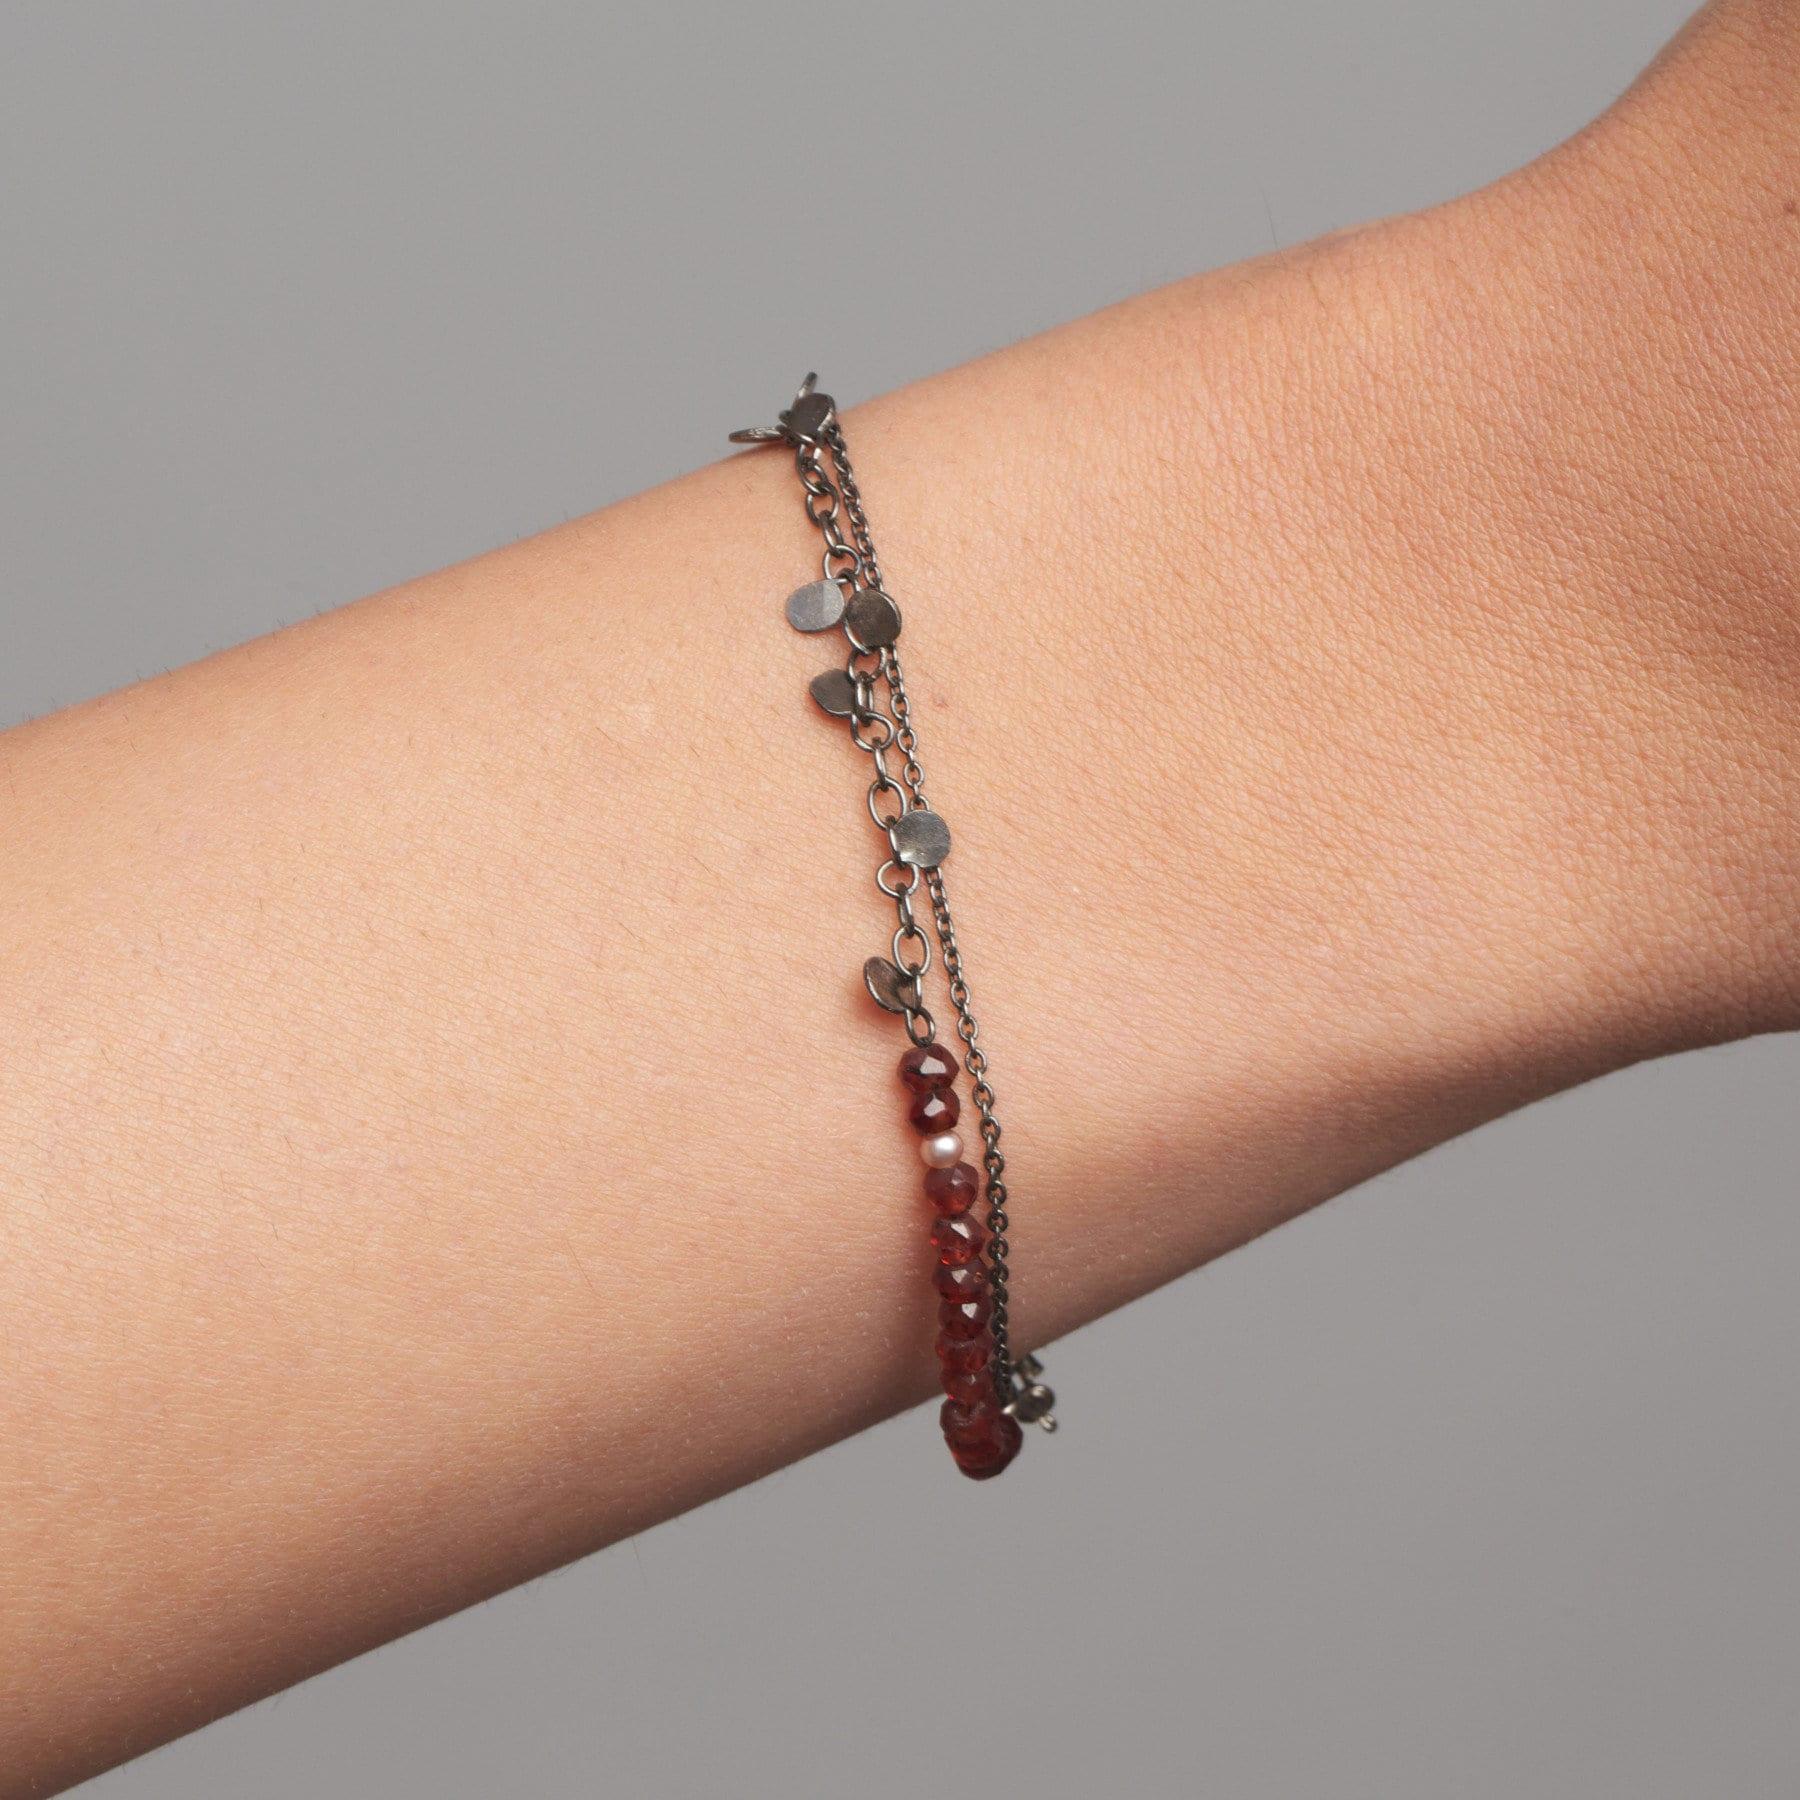 Oxidized Silver and Garnet Leaf Bracelet